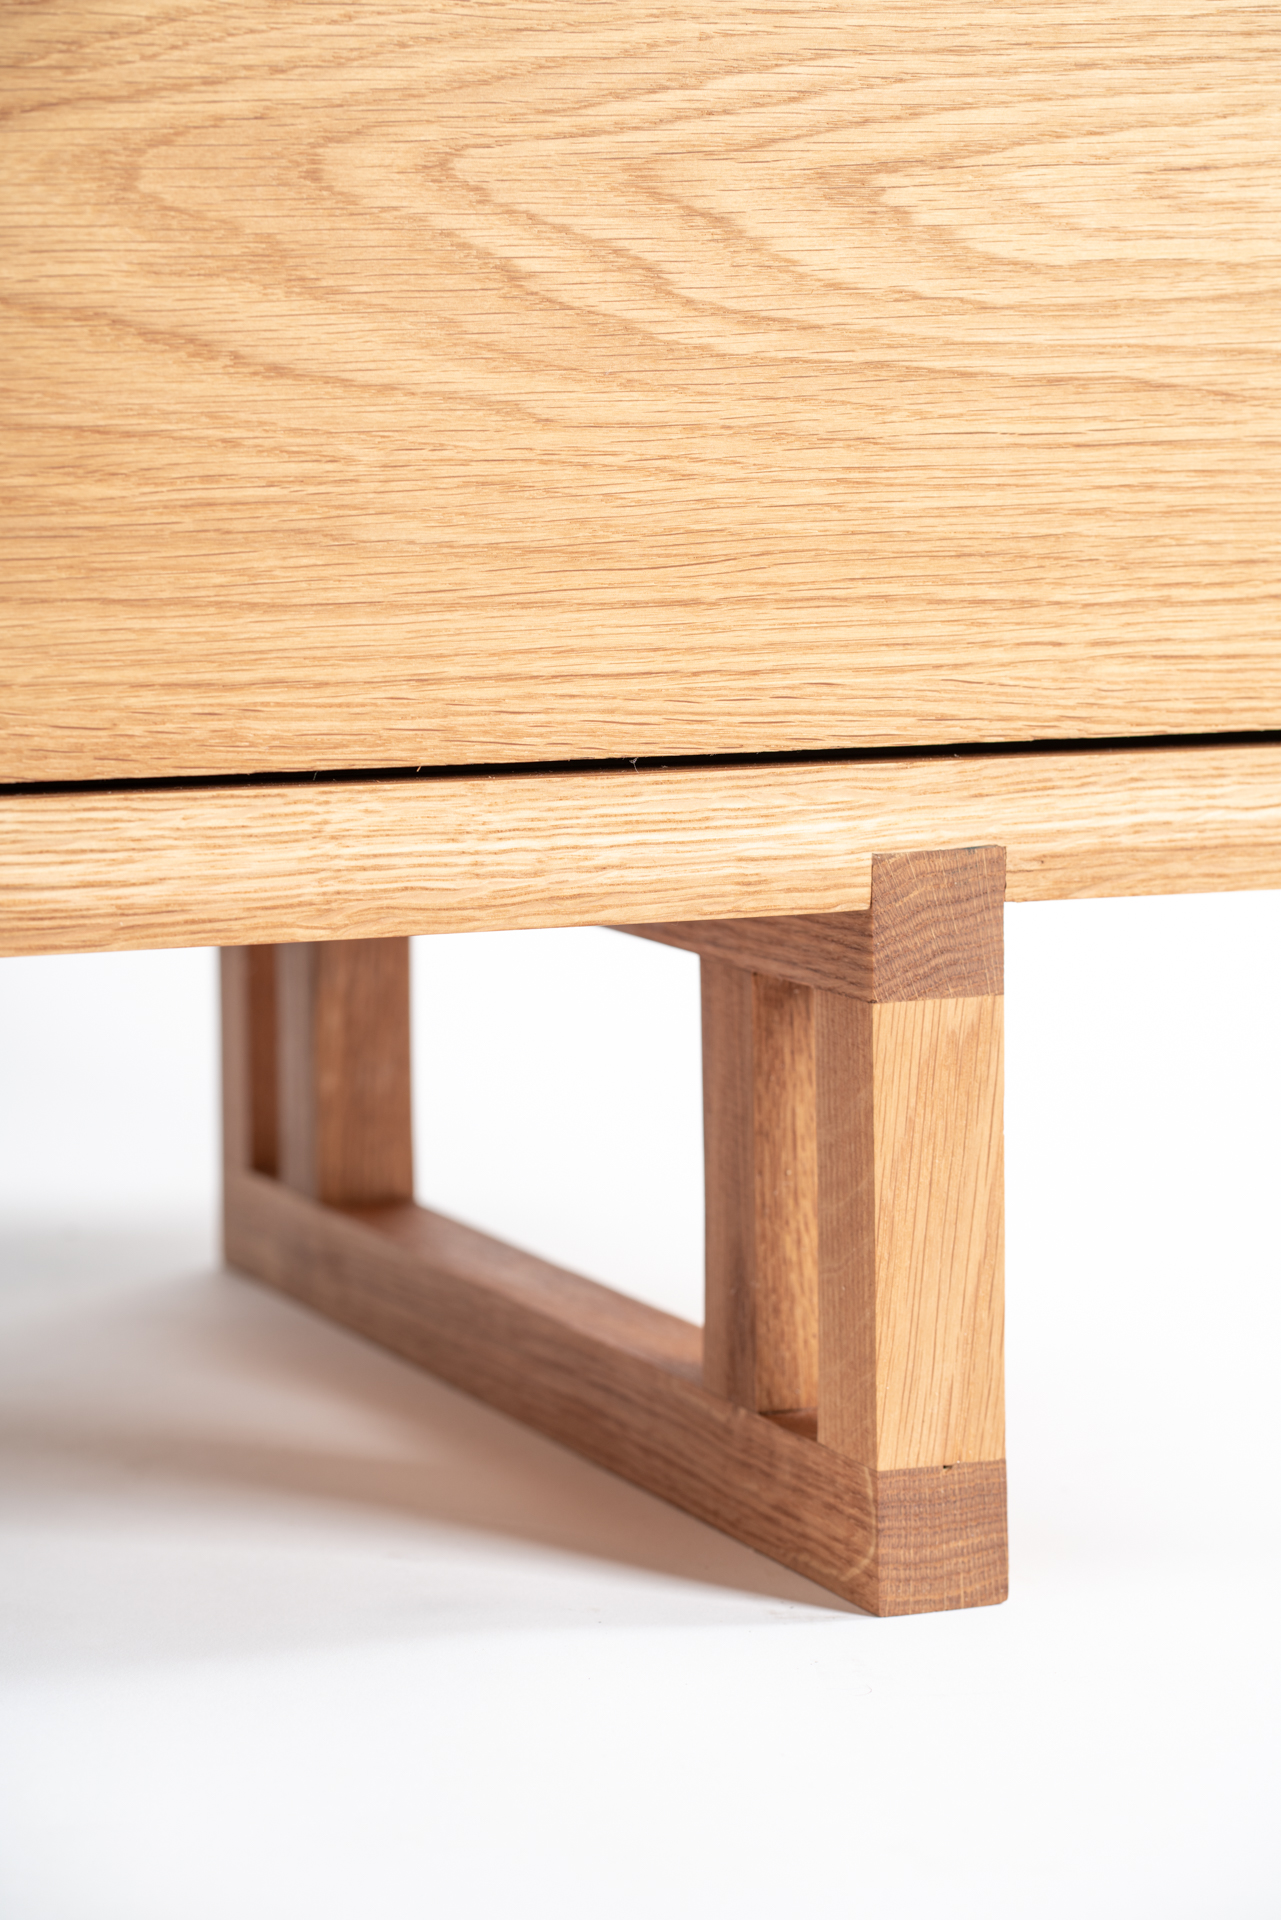 Furniture-web-52.jpg